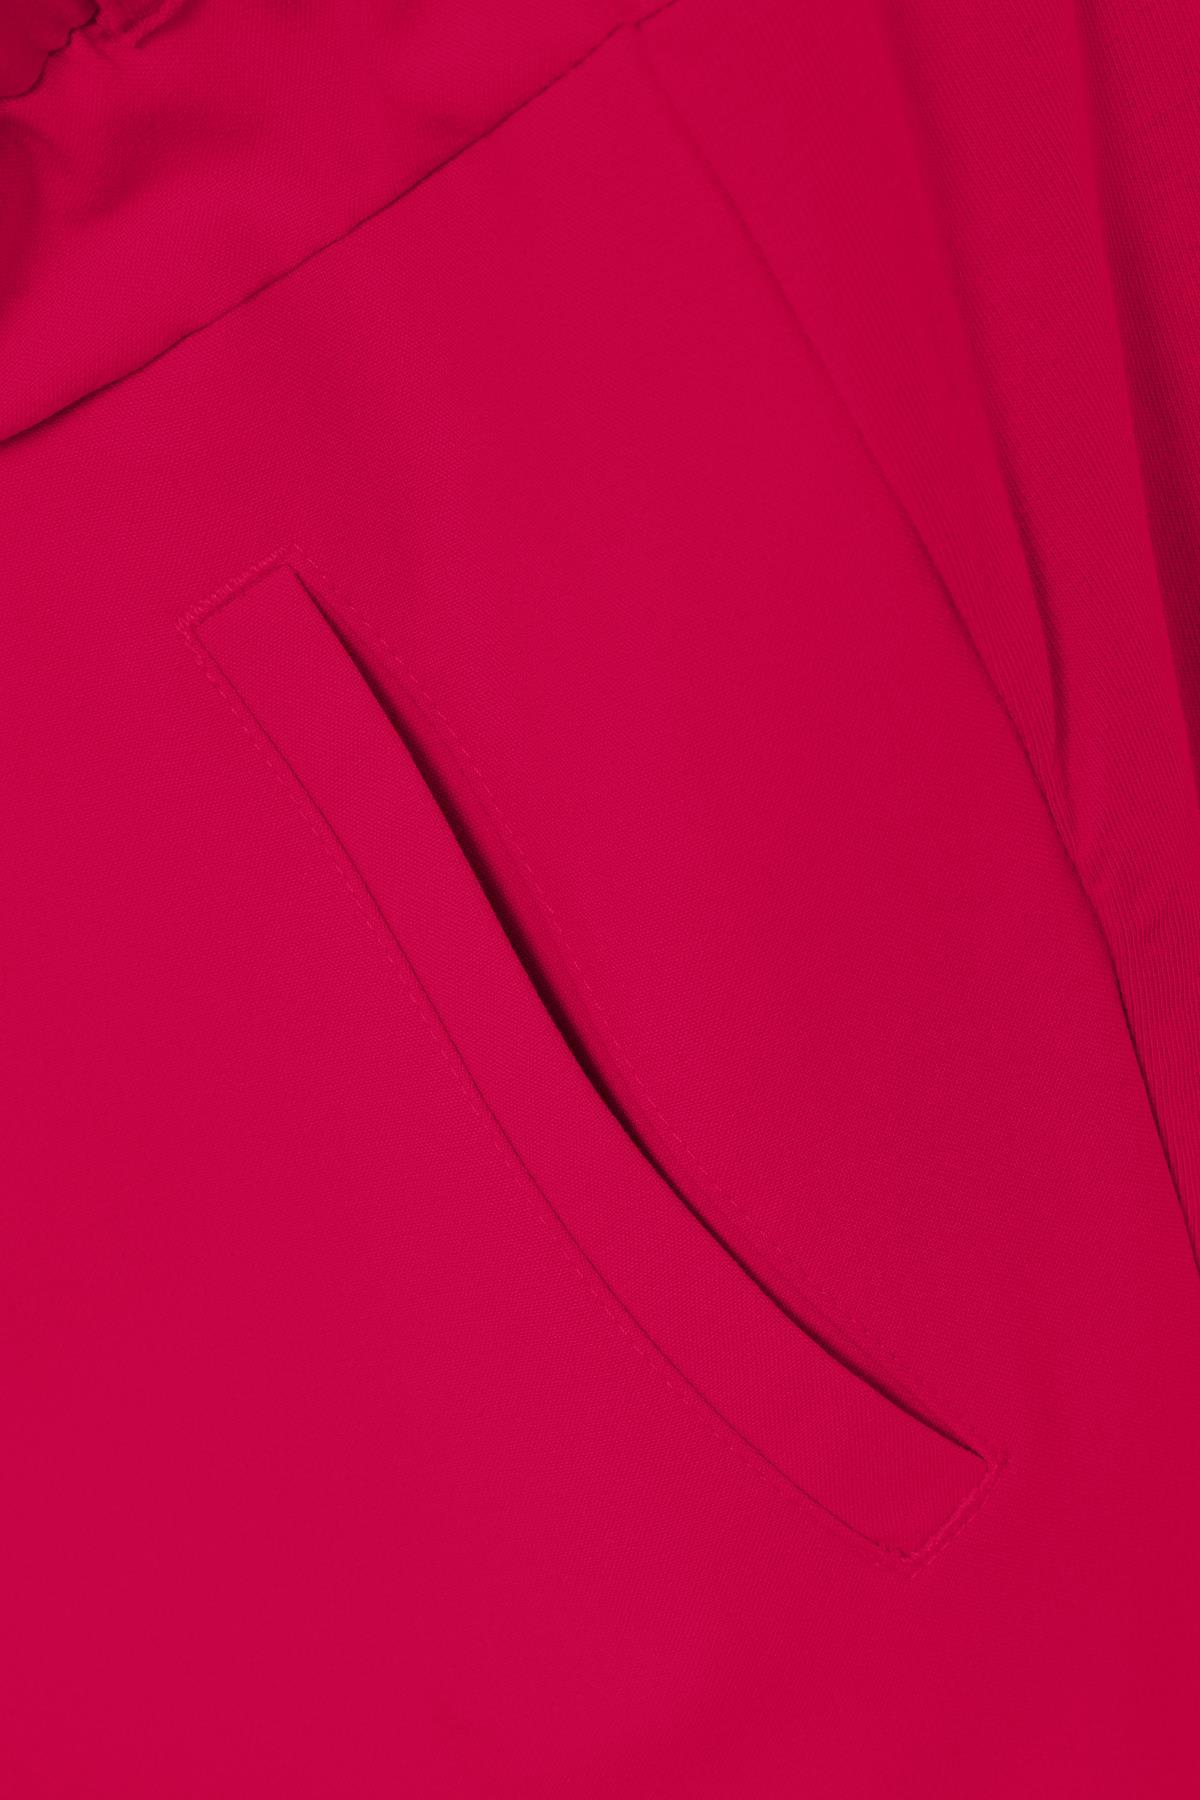 Rød Bukser fra Kaffe – Køb Rød Bukser fra str. 32-46 her